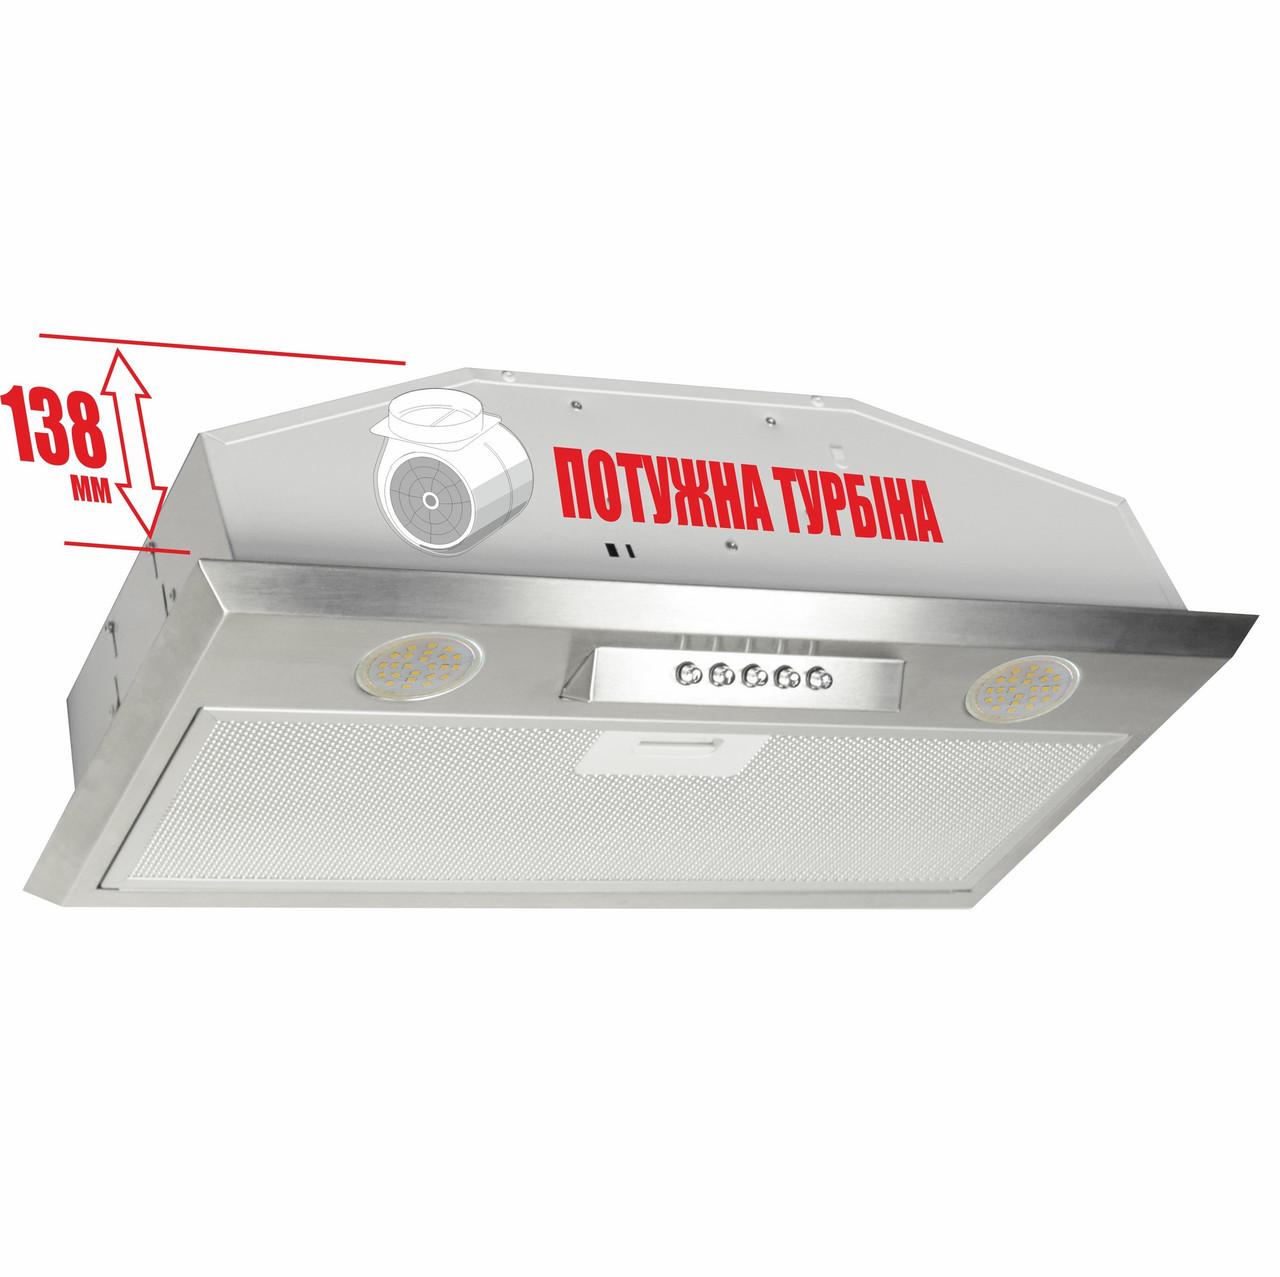 Витяжка вбудовувана кухонна ELEYUS Modul 700 LED SMD 52 IS (нержавійка)